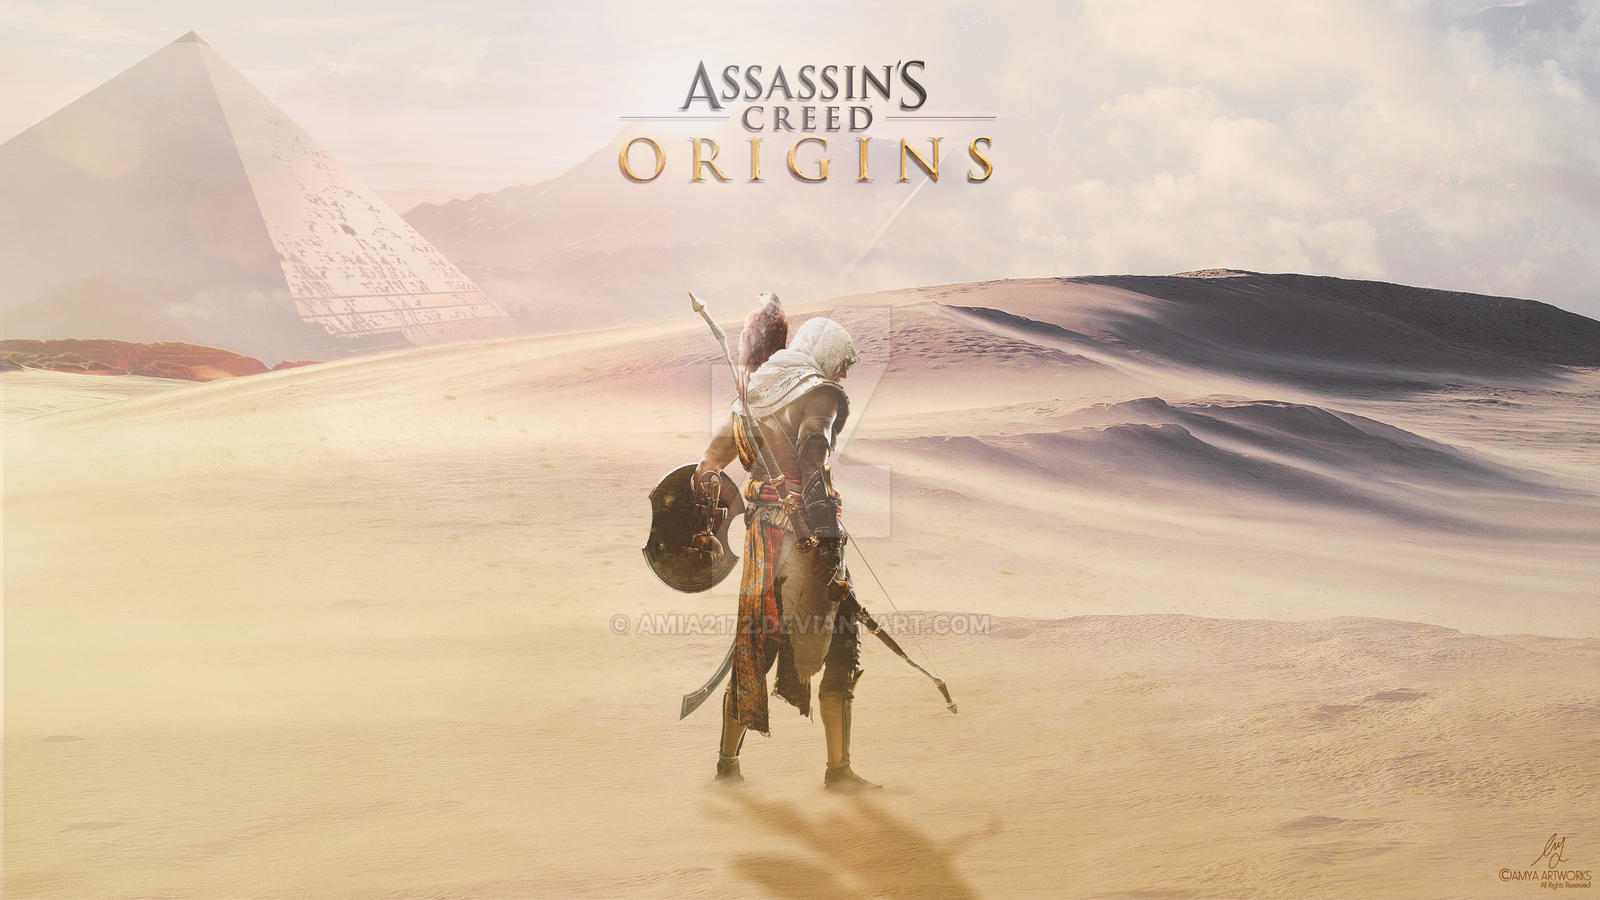 assassins creed origins wallpaper full hd